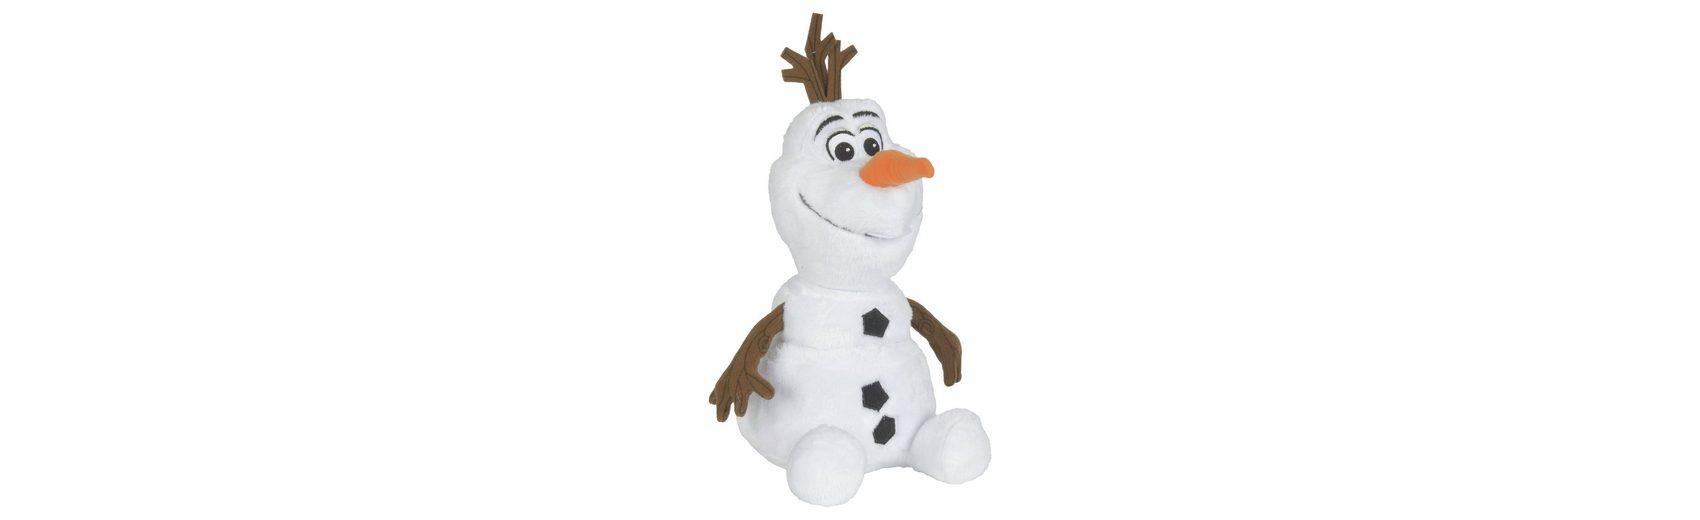 Simba Olaf sitzend 45cm